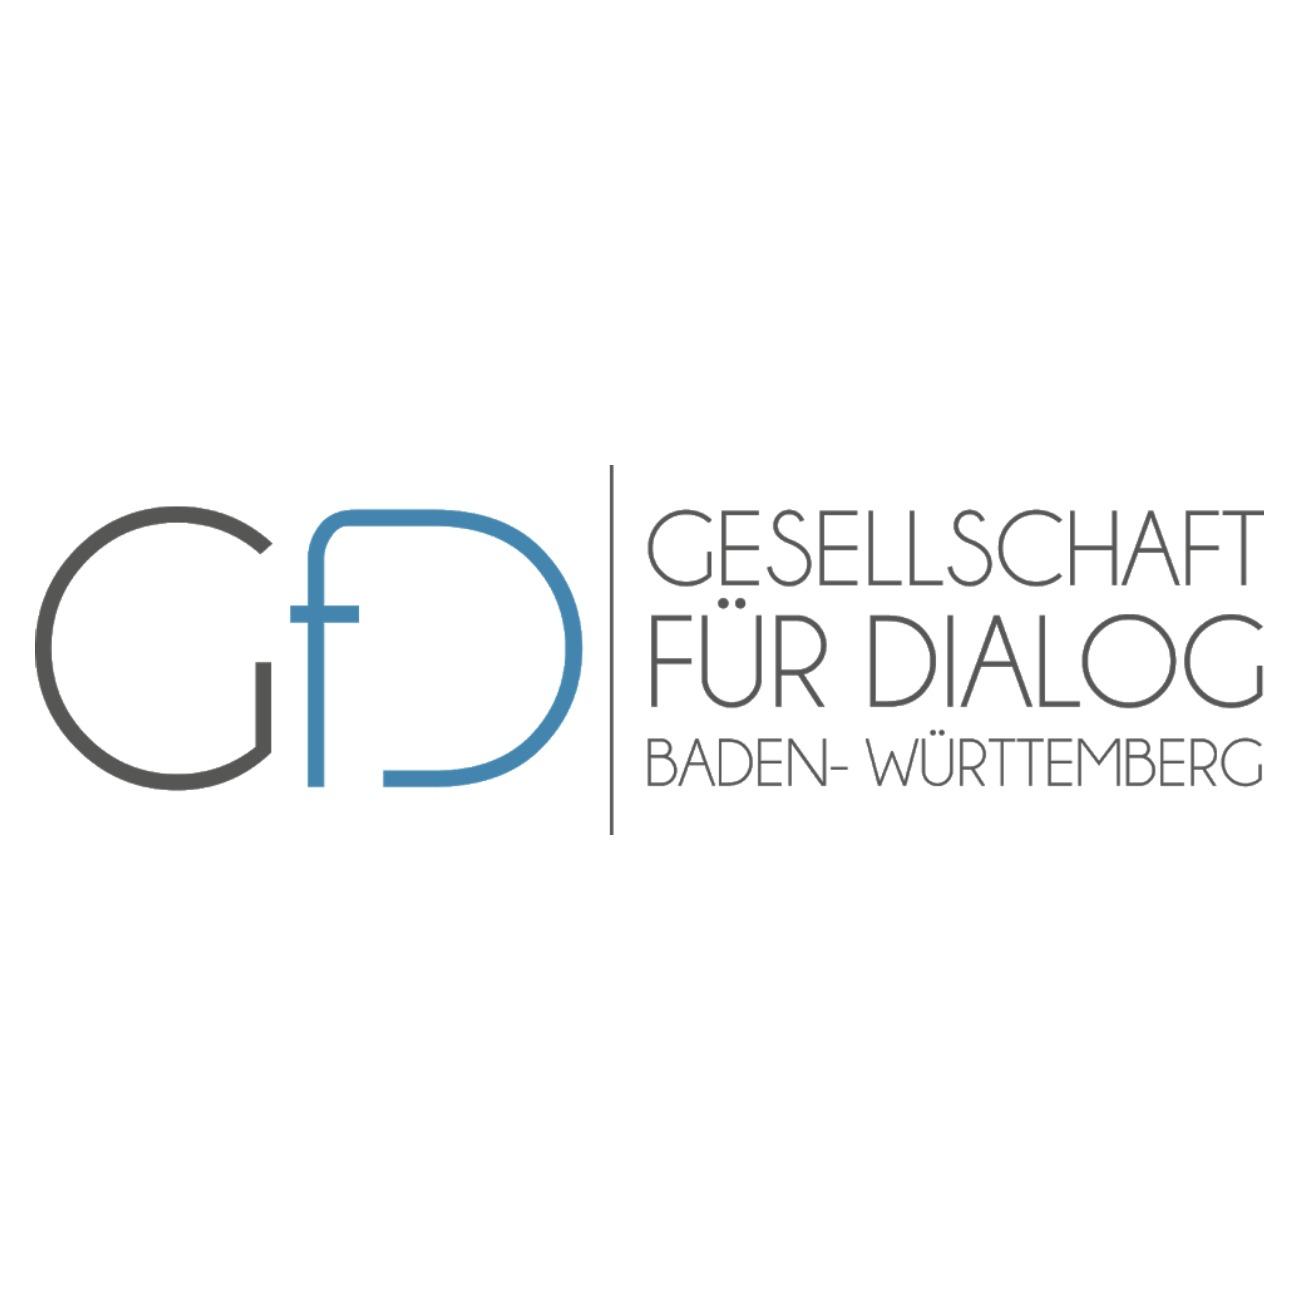 gesellschaft fur dialog baden wuertemberg logo